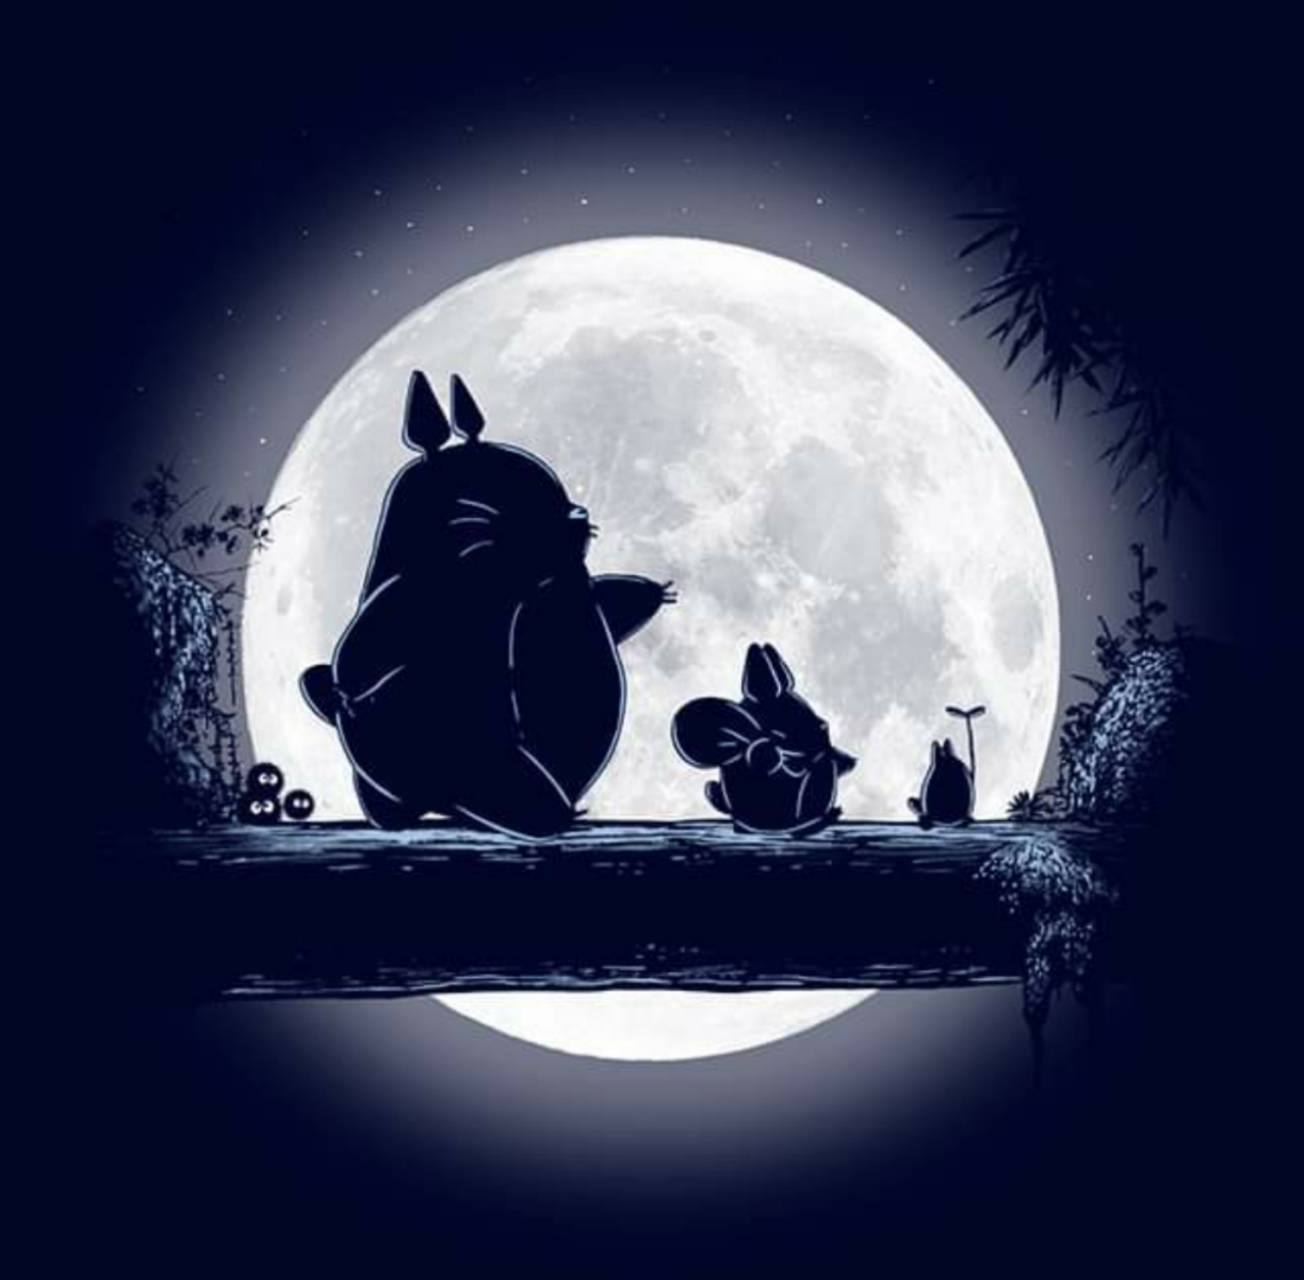 My Neighbor Totoro Wallpaper By Sweetlanaz 6f Free On Zedge